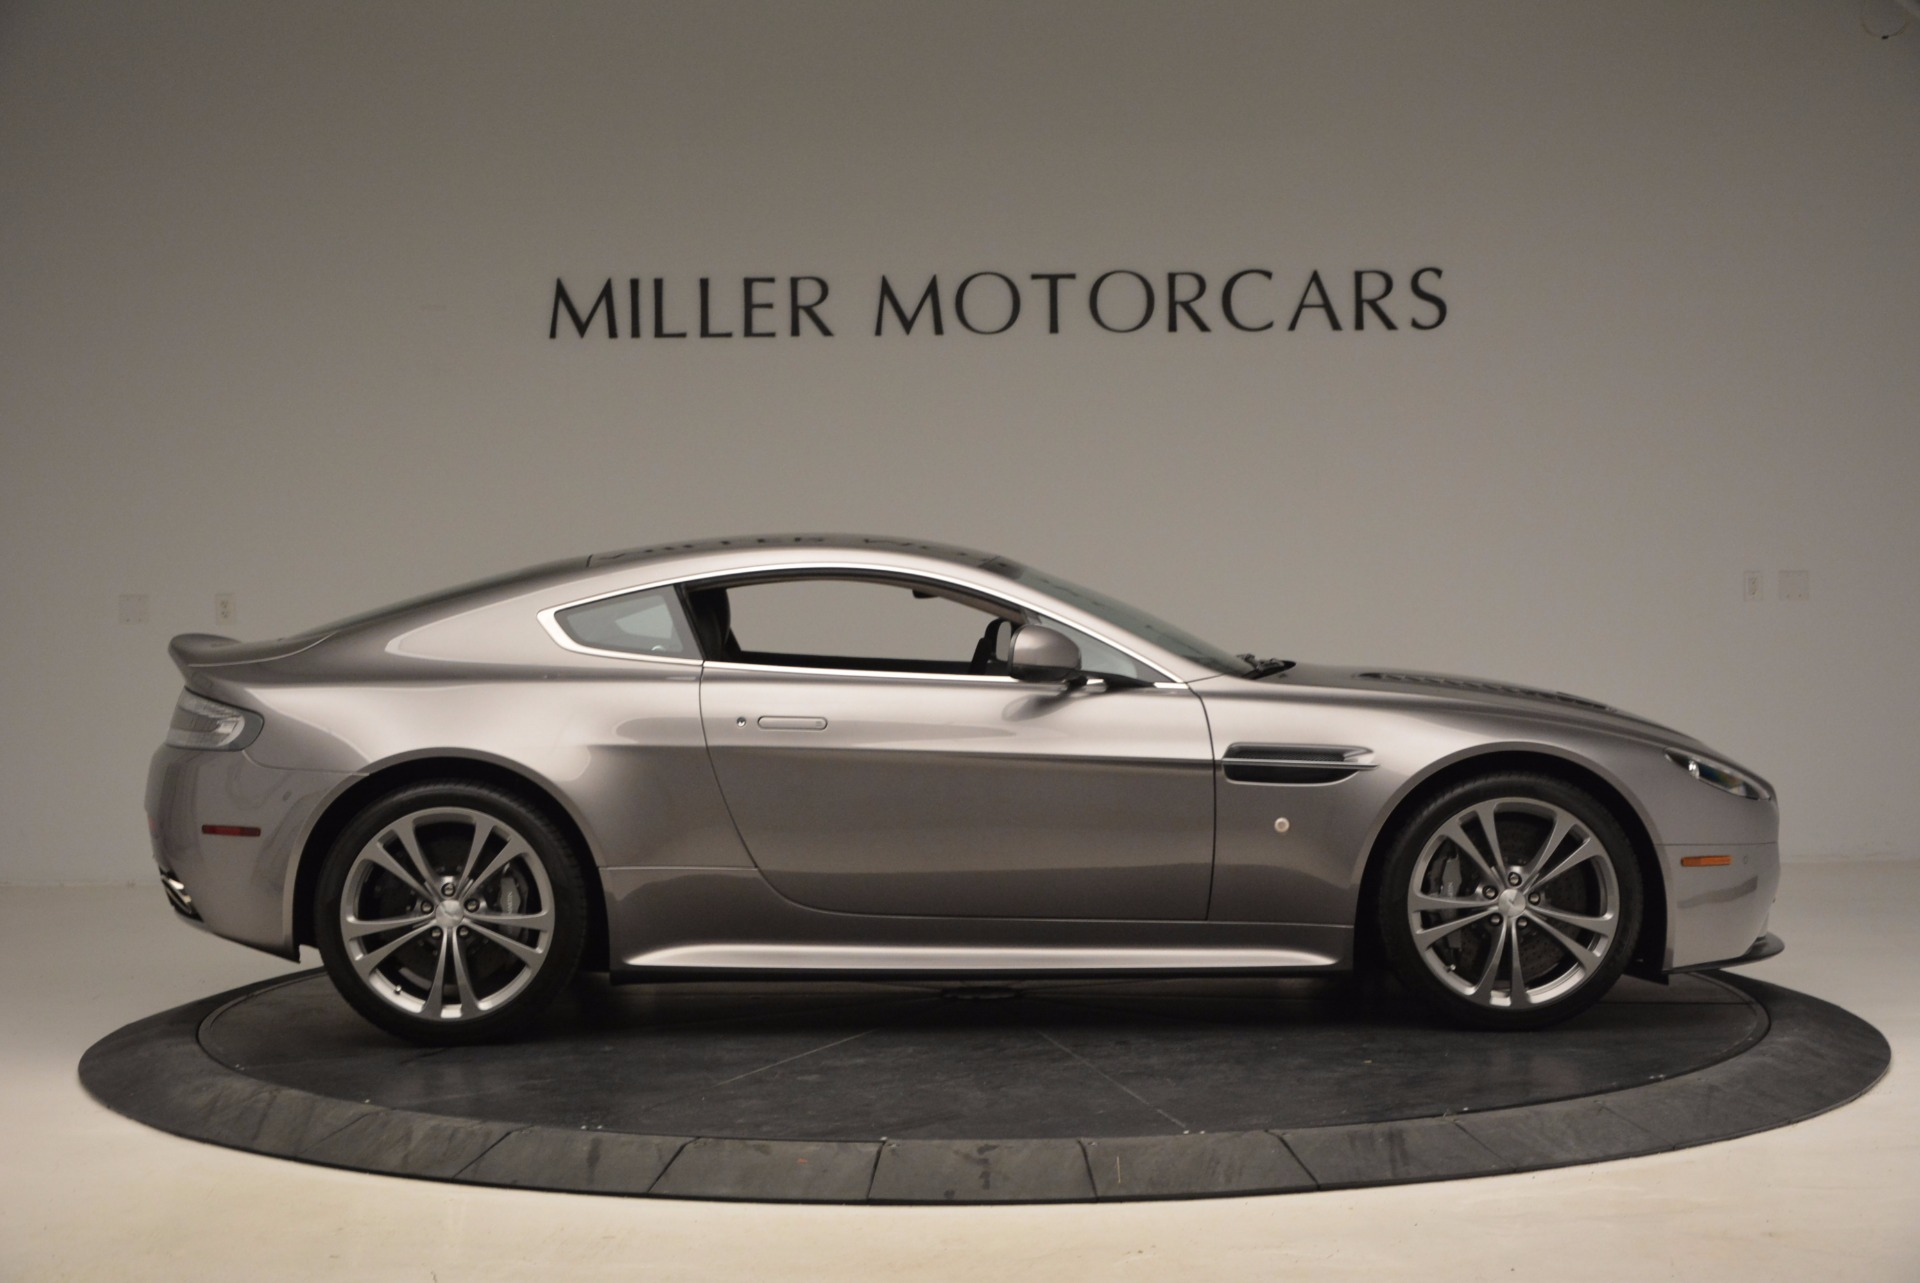 Used 2012 Aston Martin V12 Vantage  For Sale In Greenwich, CT 994_p9